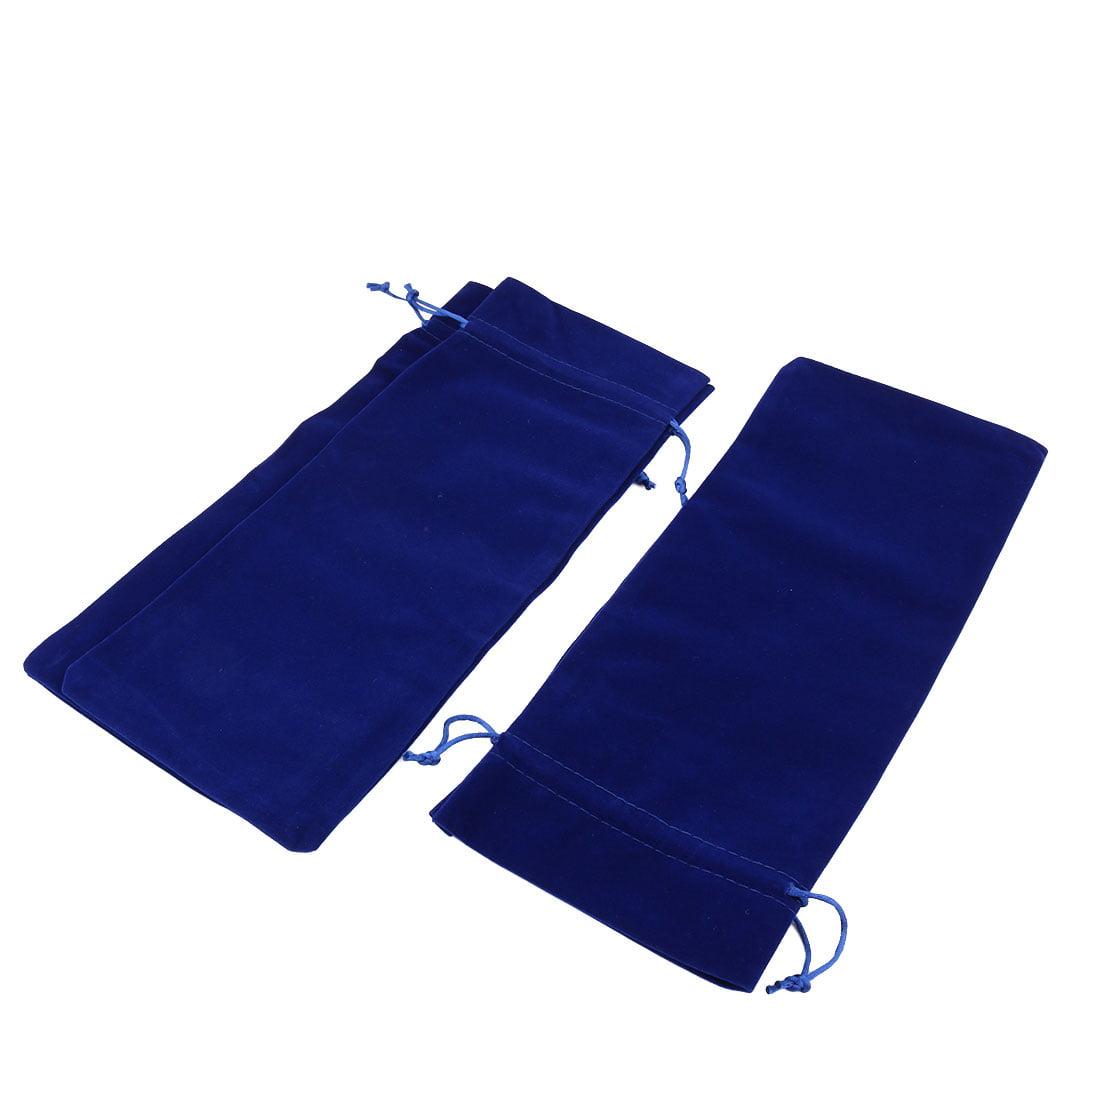 Wedding Gift Velvet Drawstring Wine Storage Organizer Bag Blue 35cm x 15cm 3 Pcs